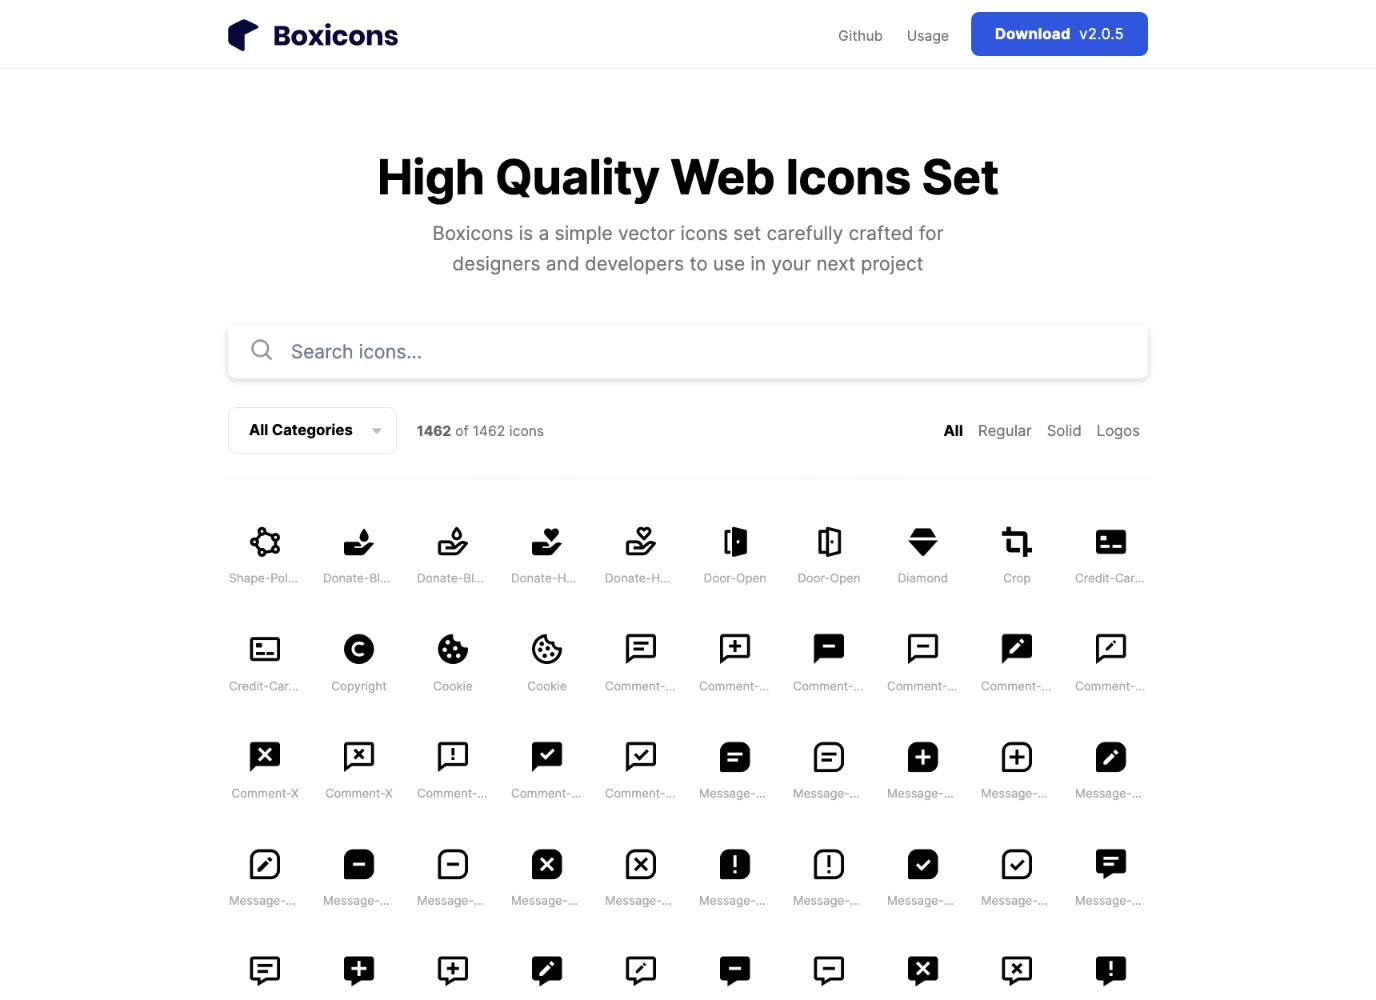 Boxicons icon set